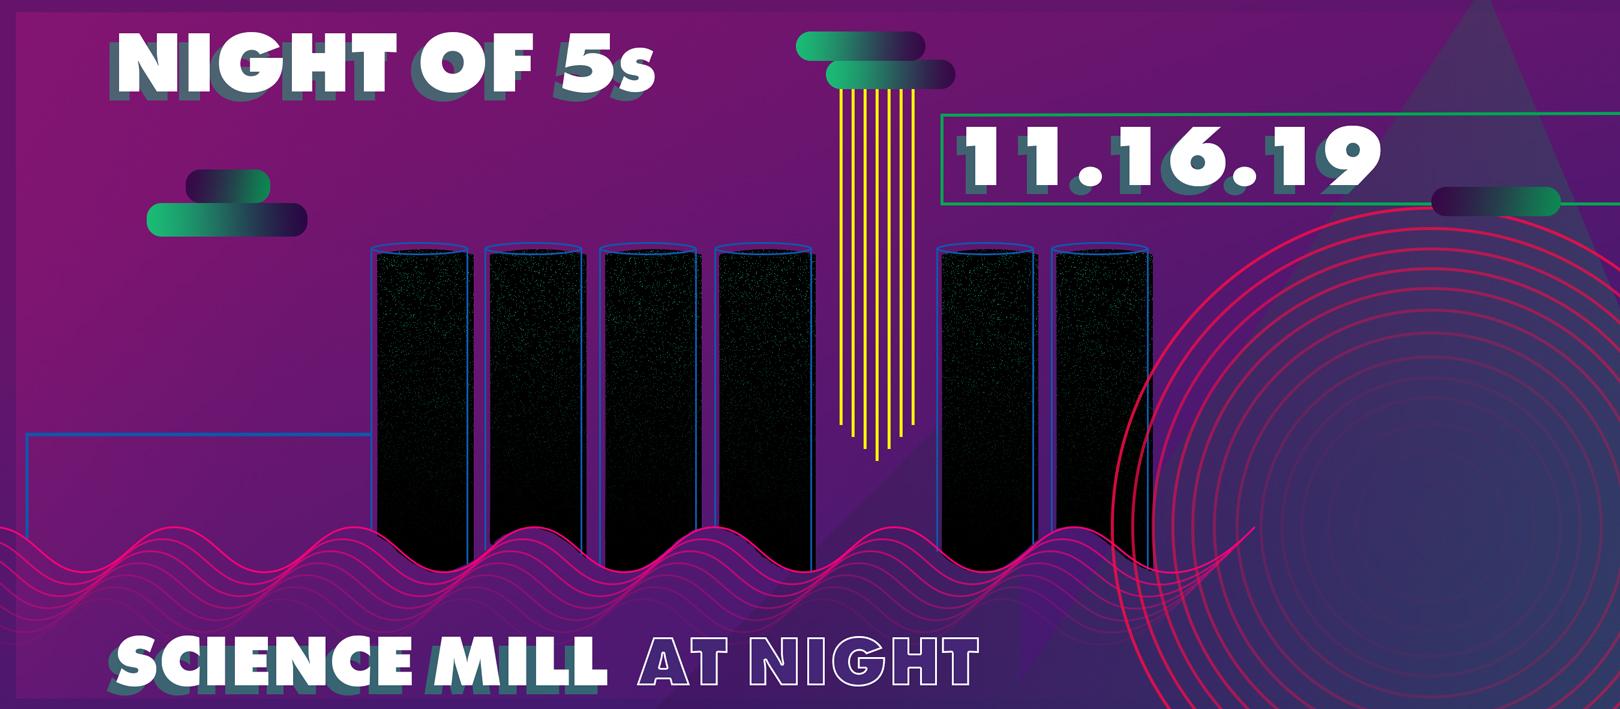 NIGHT_OF_5S_web.jpg